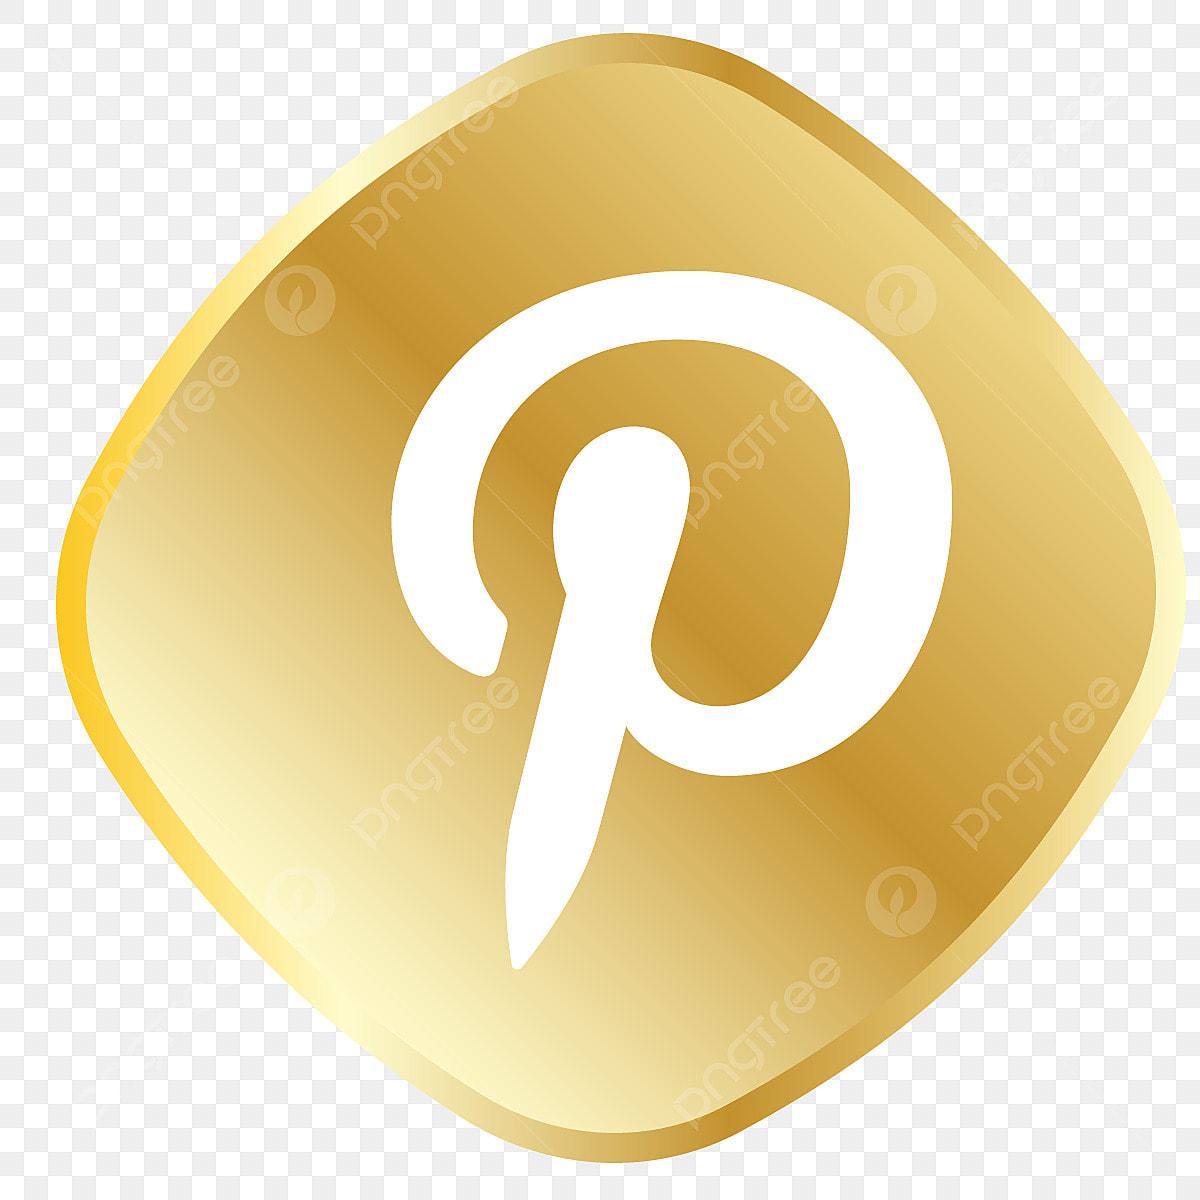 Golden Pinterest Icon, Social Media Vector, Royal, Golden ...Pinterest Circle Icon